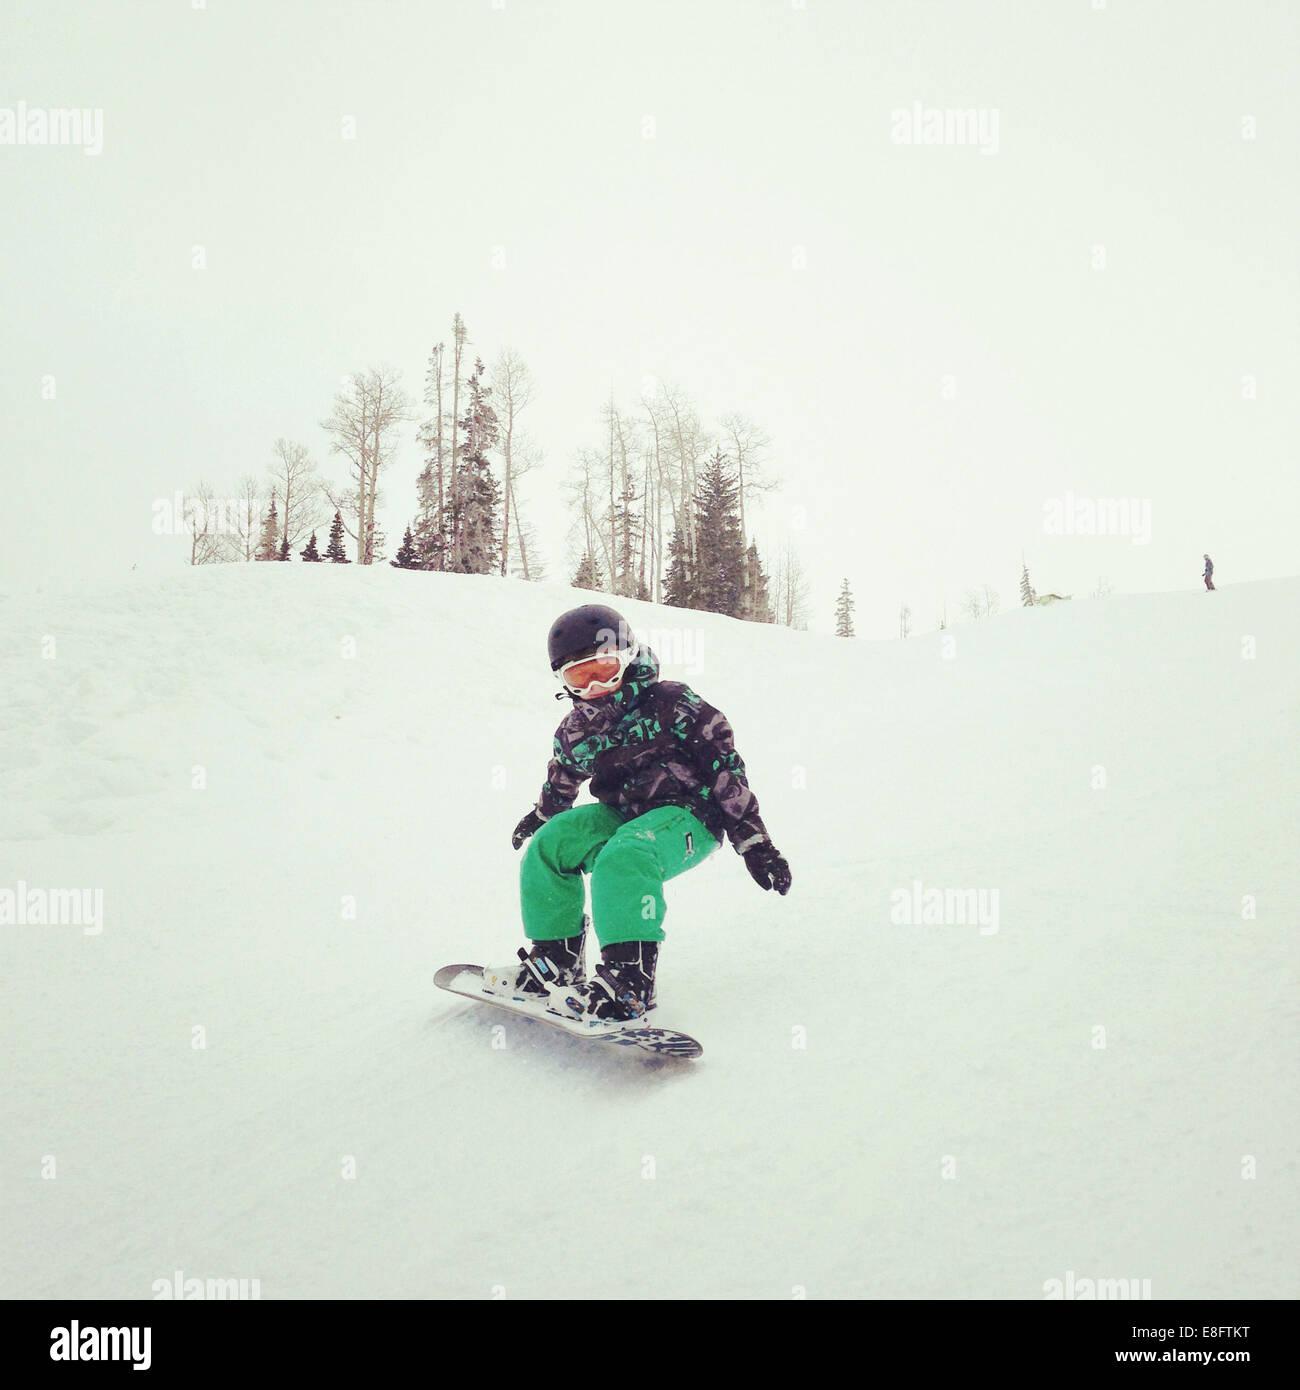 Boy snowboarding down hill - Stock Image